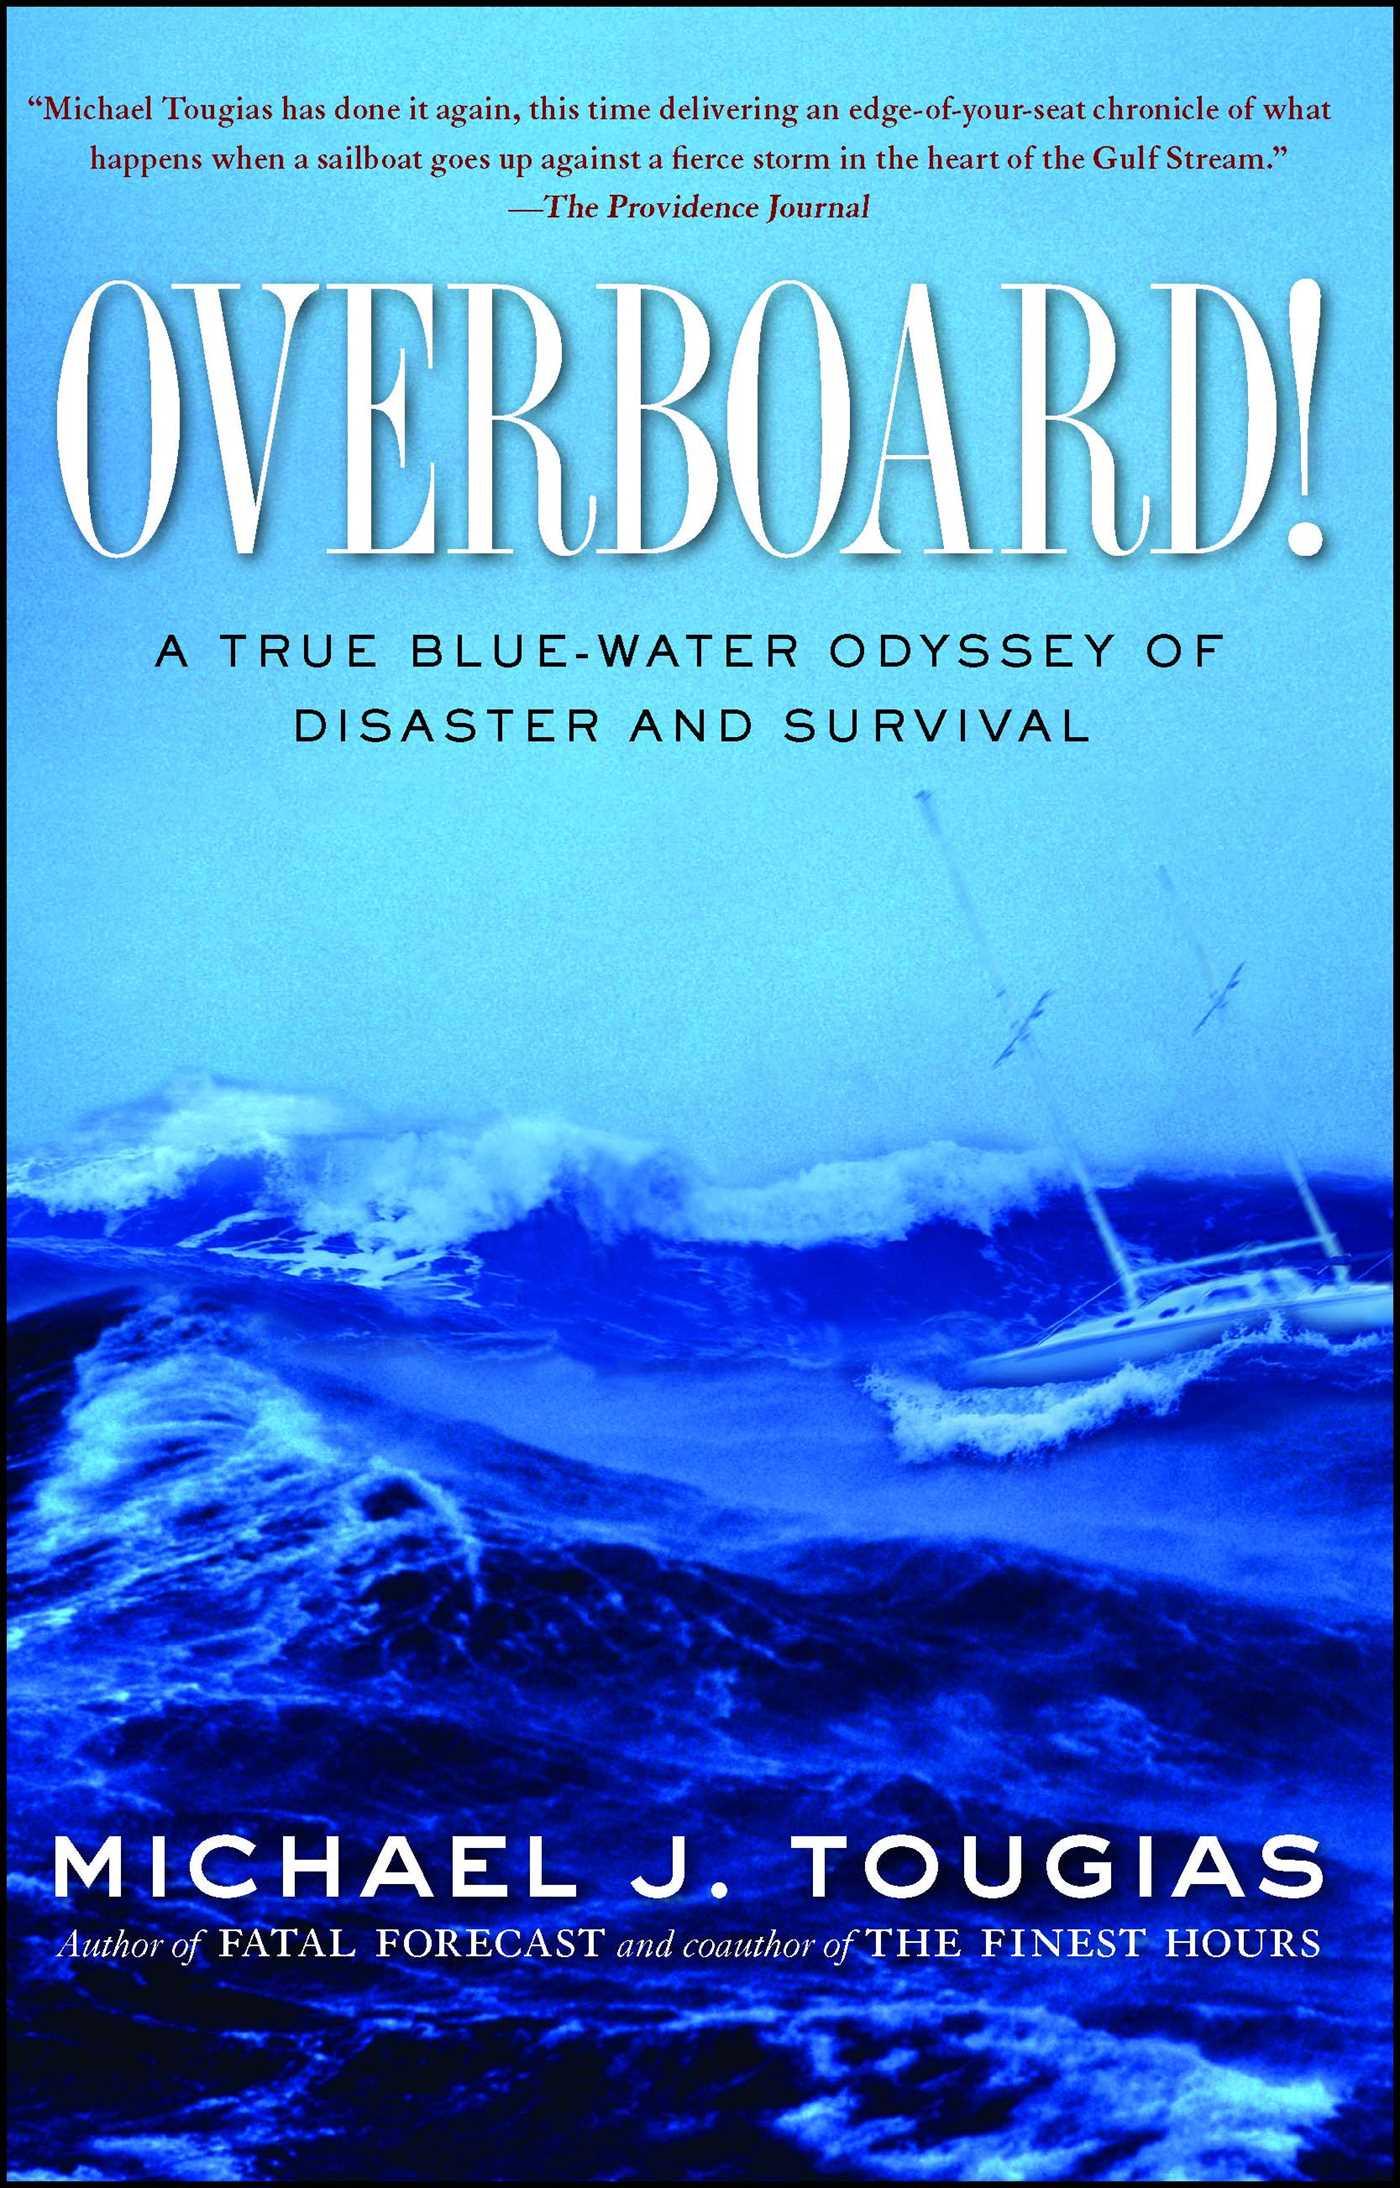 Overboard 9781439153628 hr